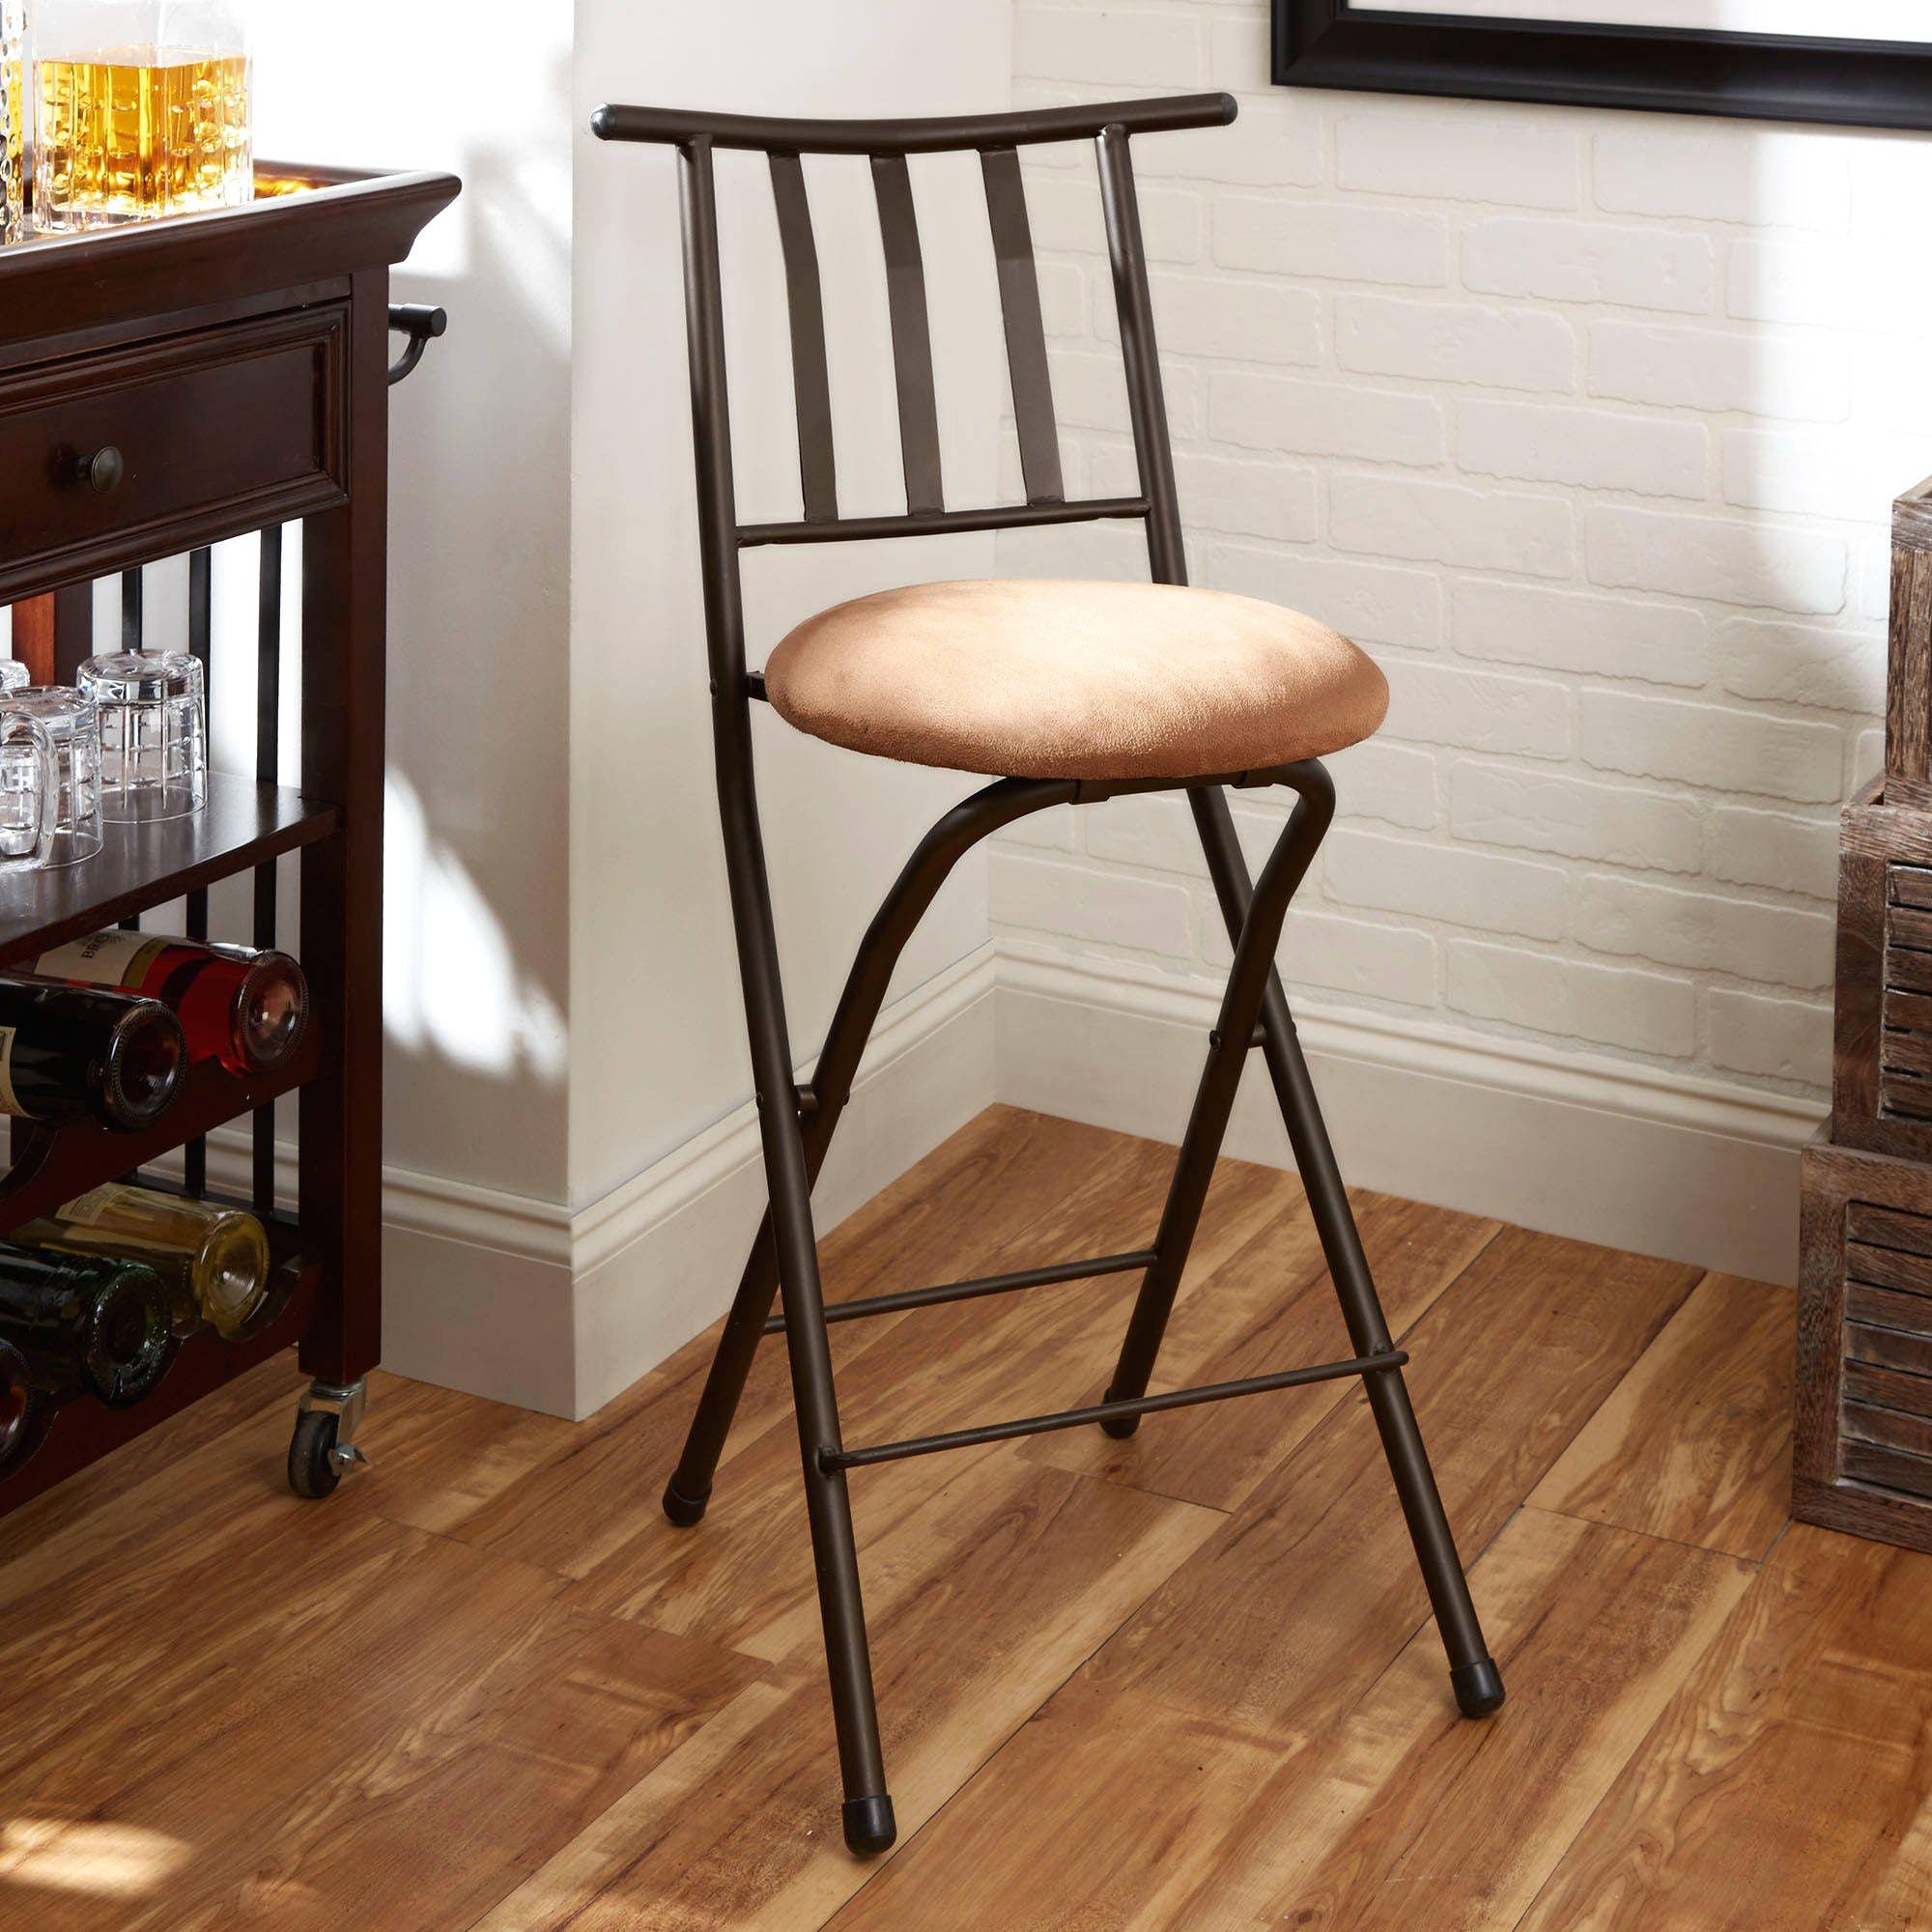 Mobel Wunderschone Bar Hocker Kissen Runde High Definition How